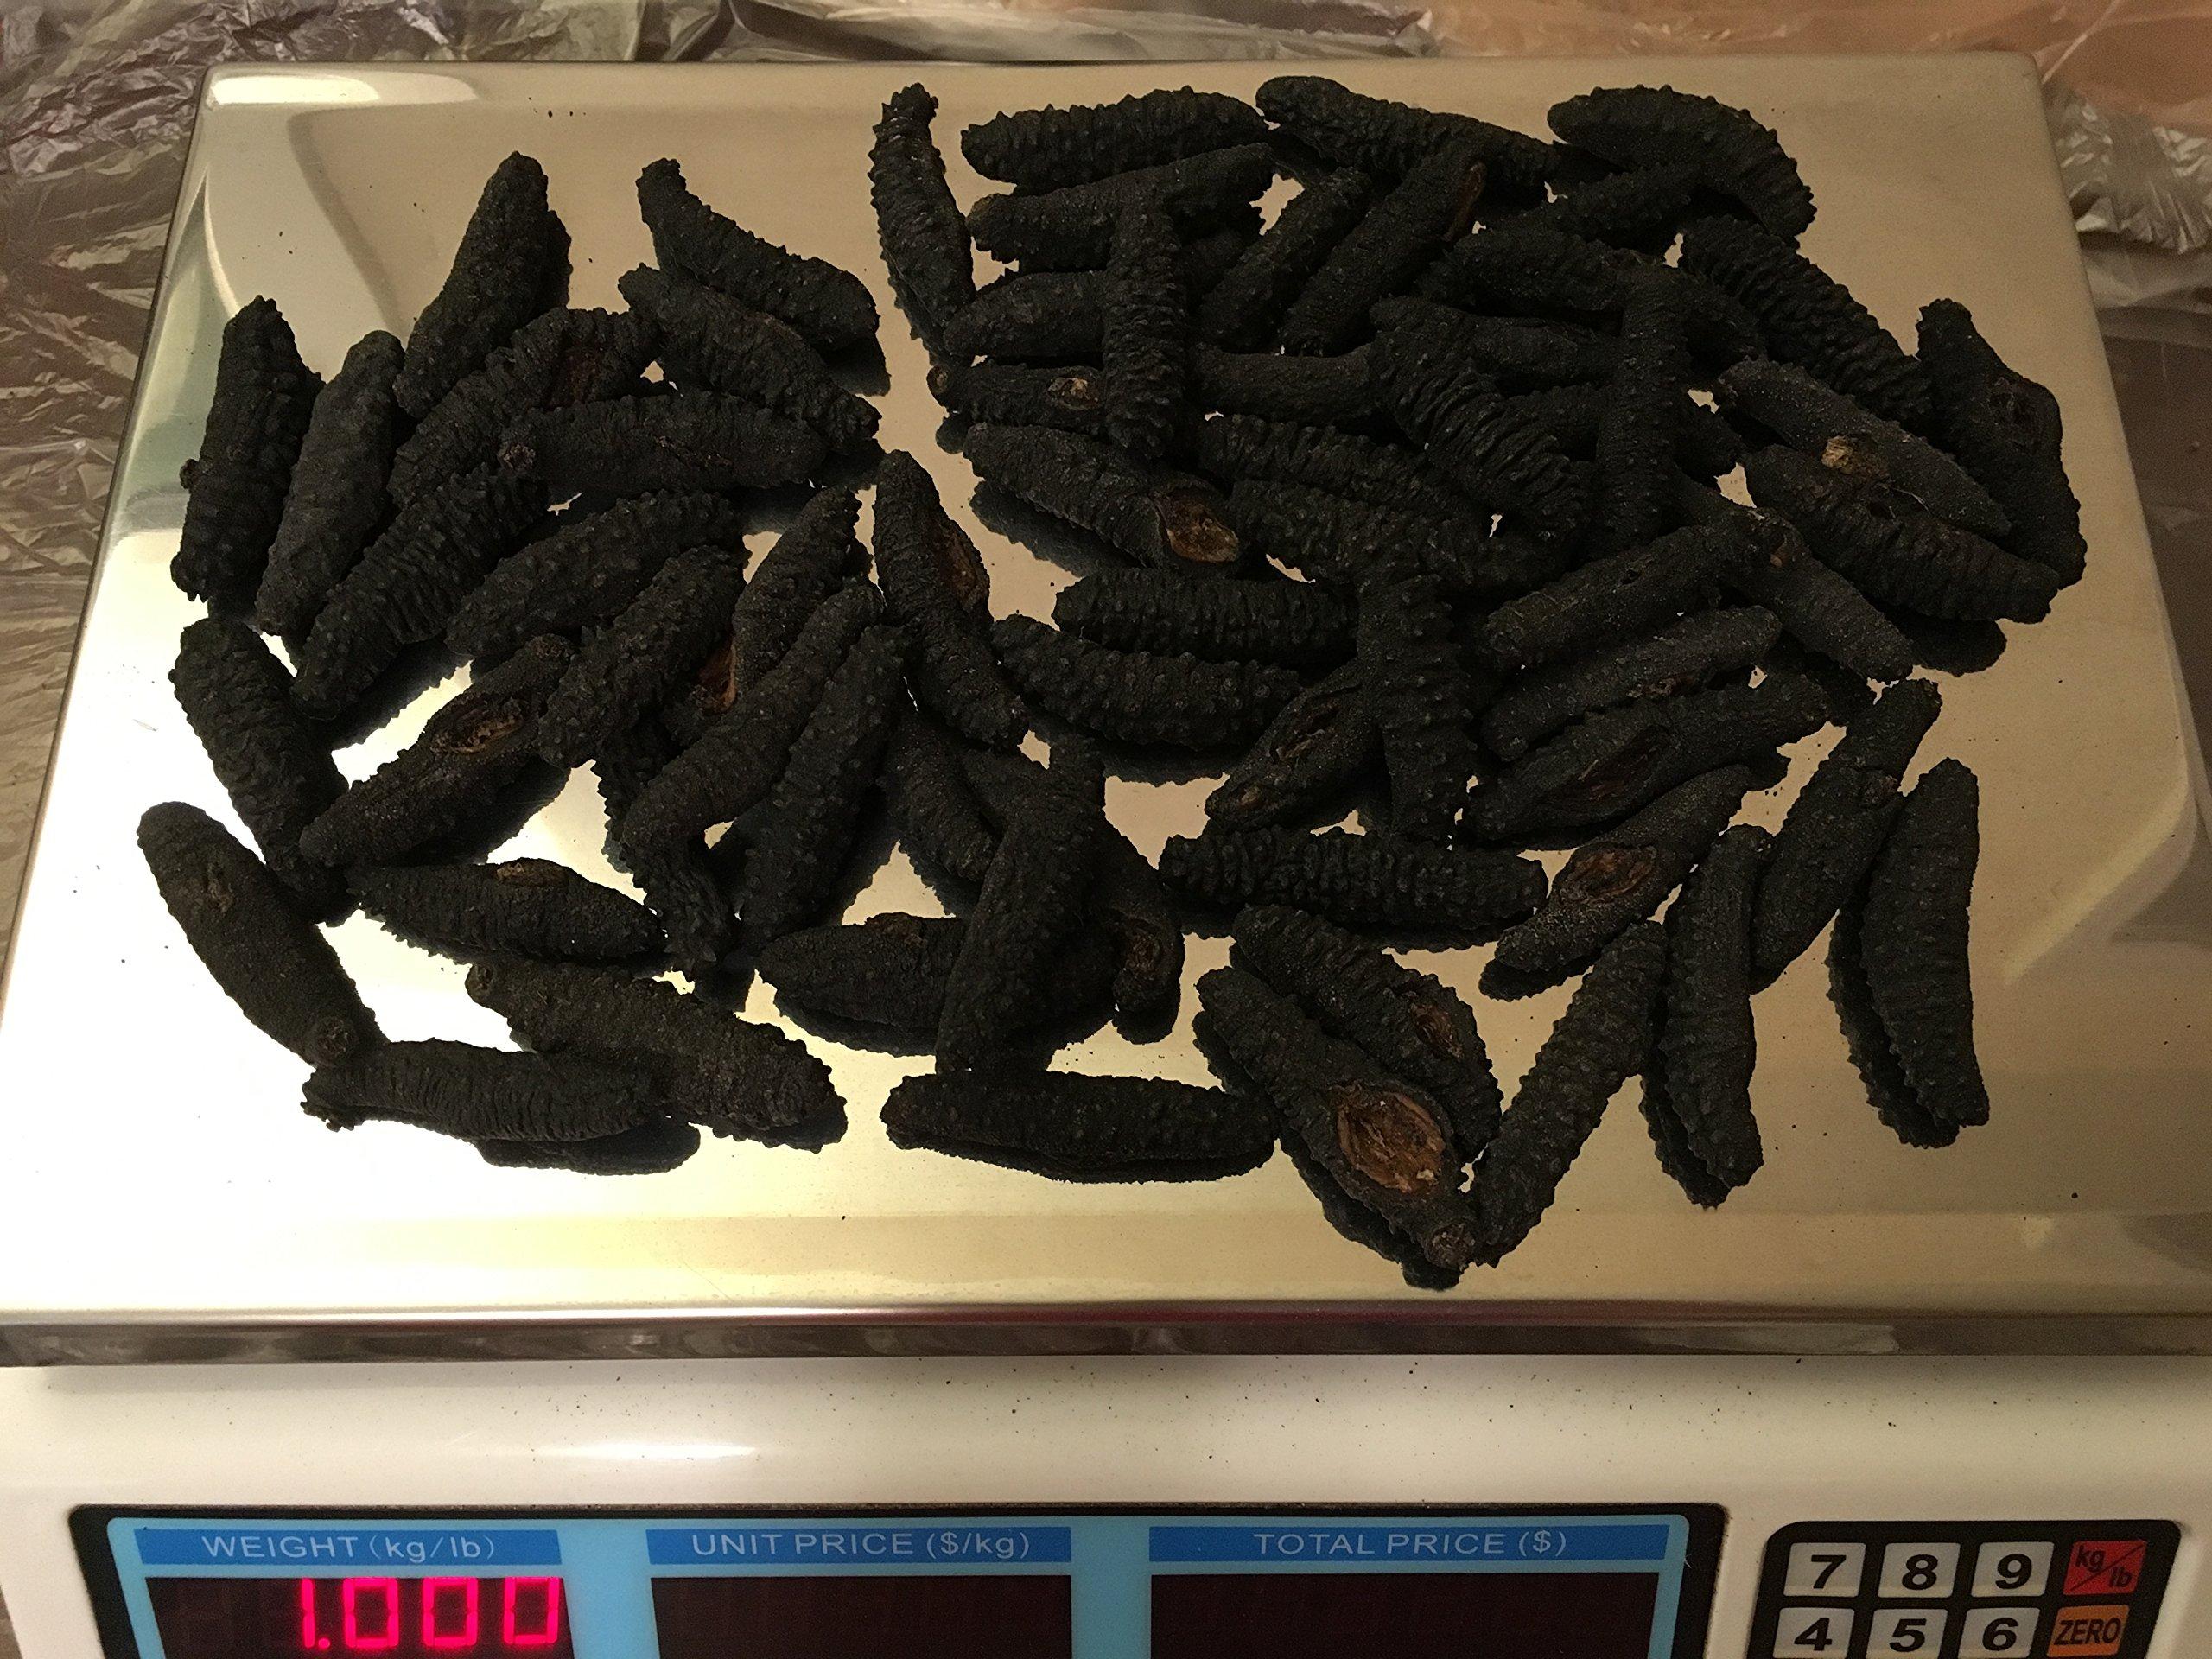 Dried Wild Sea Cucumber,岩刺参,Holothuria Mammata, Grade AAAA (LARGE size) 1LB